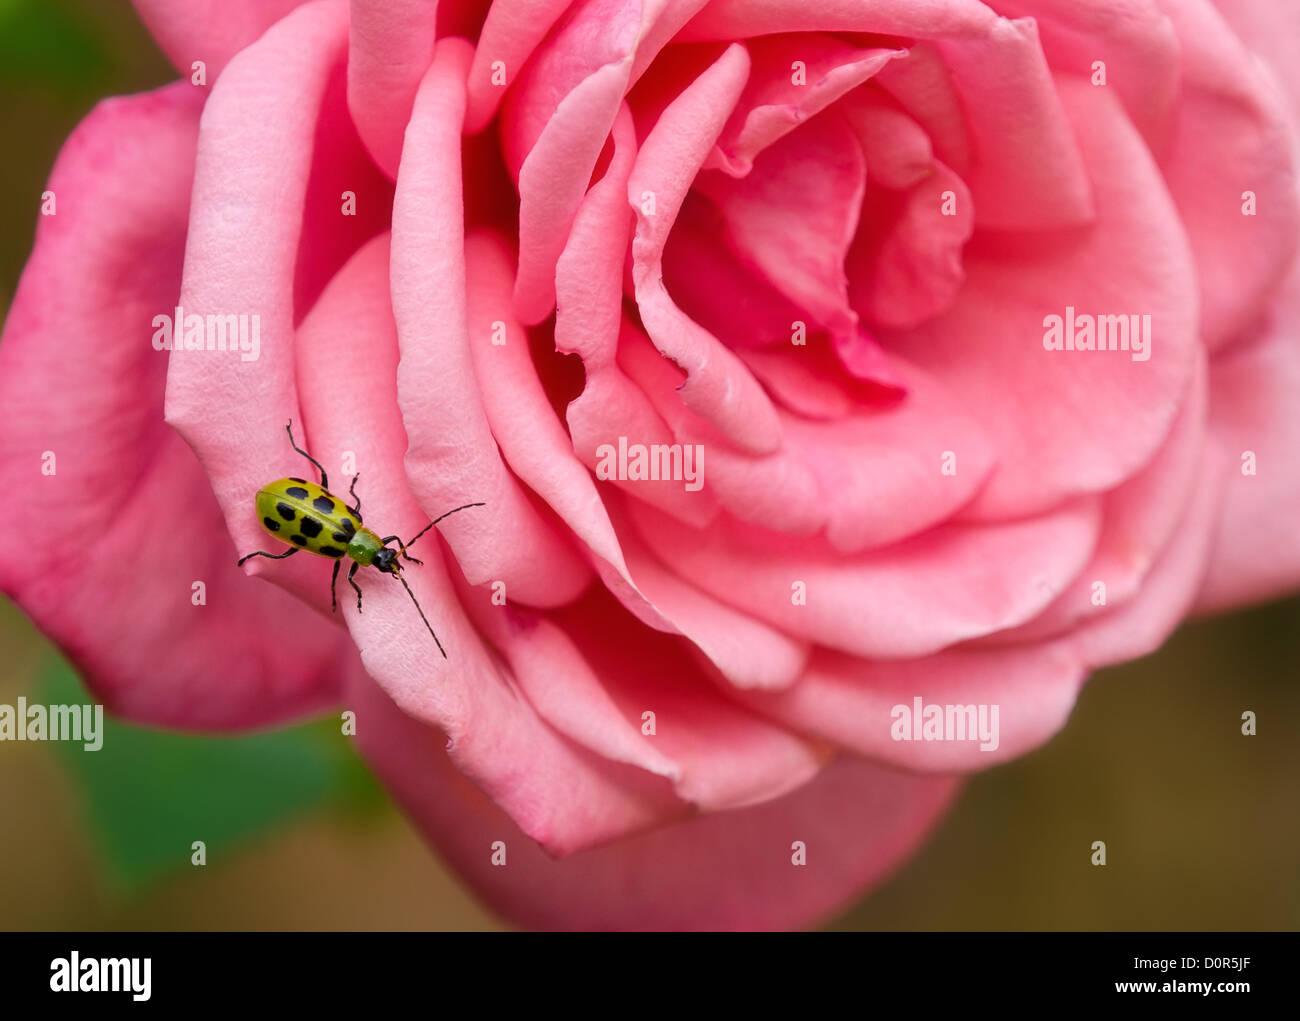 Spotted Cucumber Beetle (Diabrotica undecimpunctata) on rose blossom - Stock Image